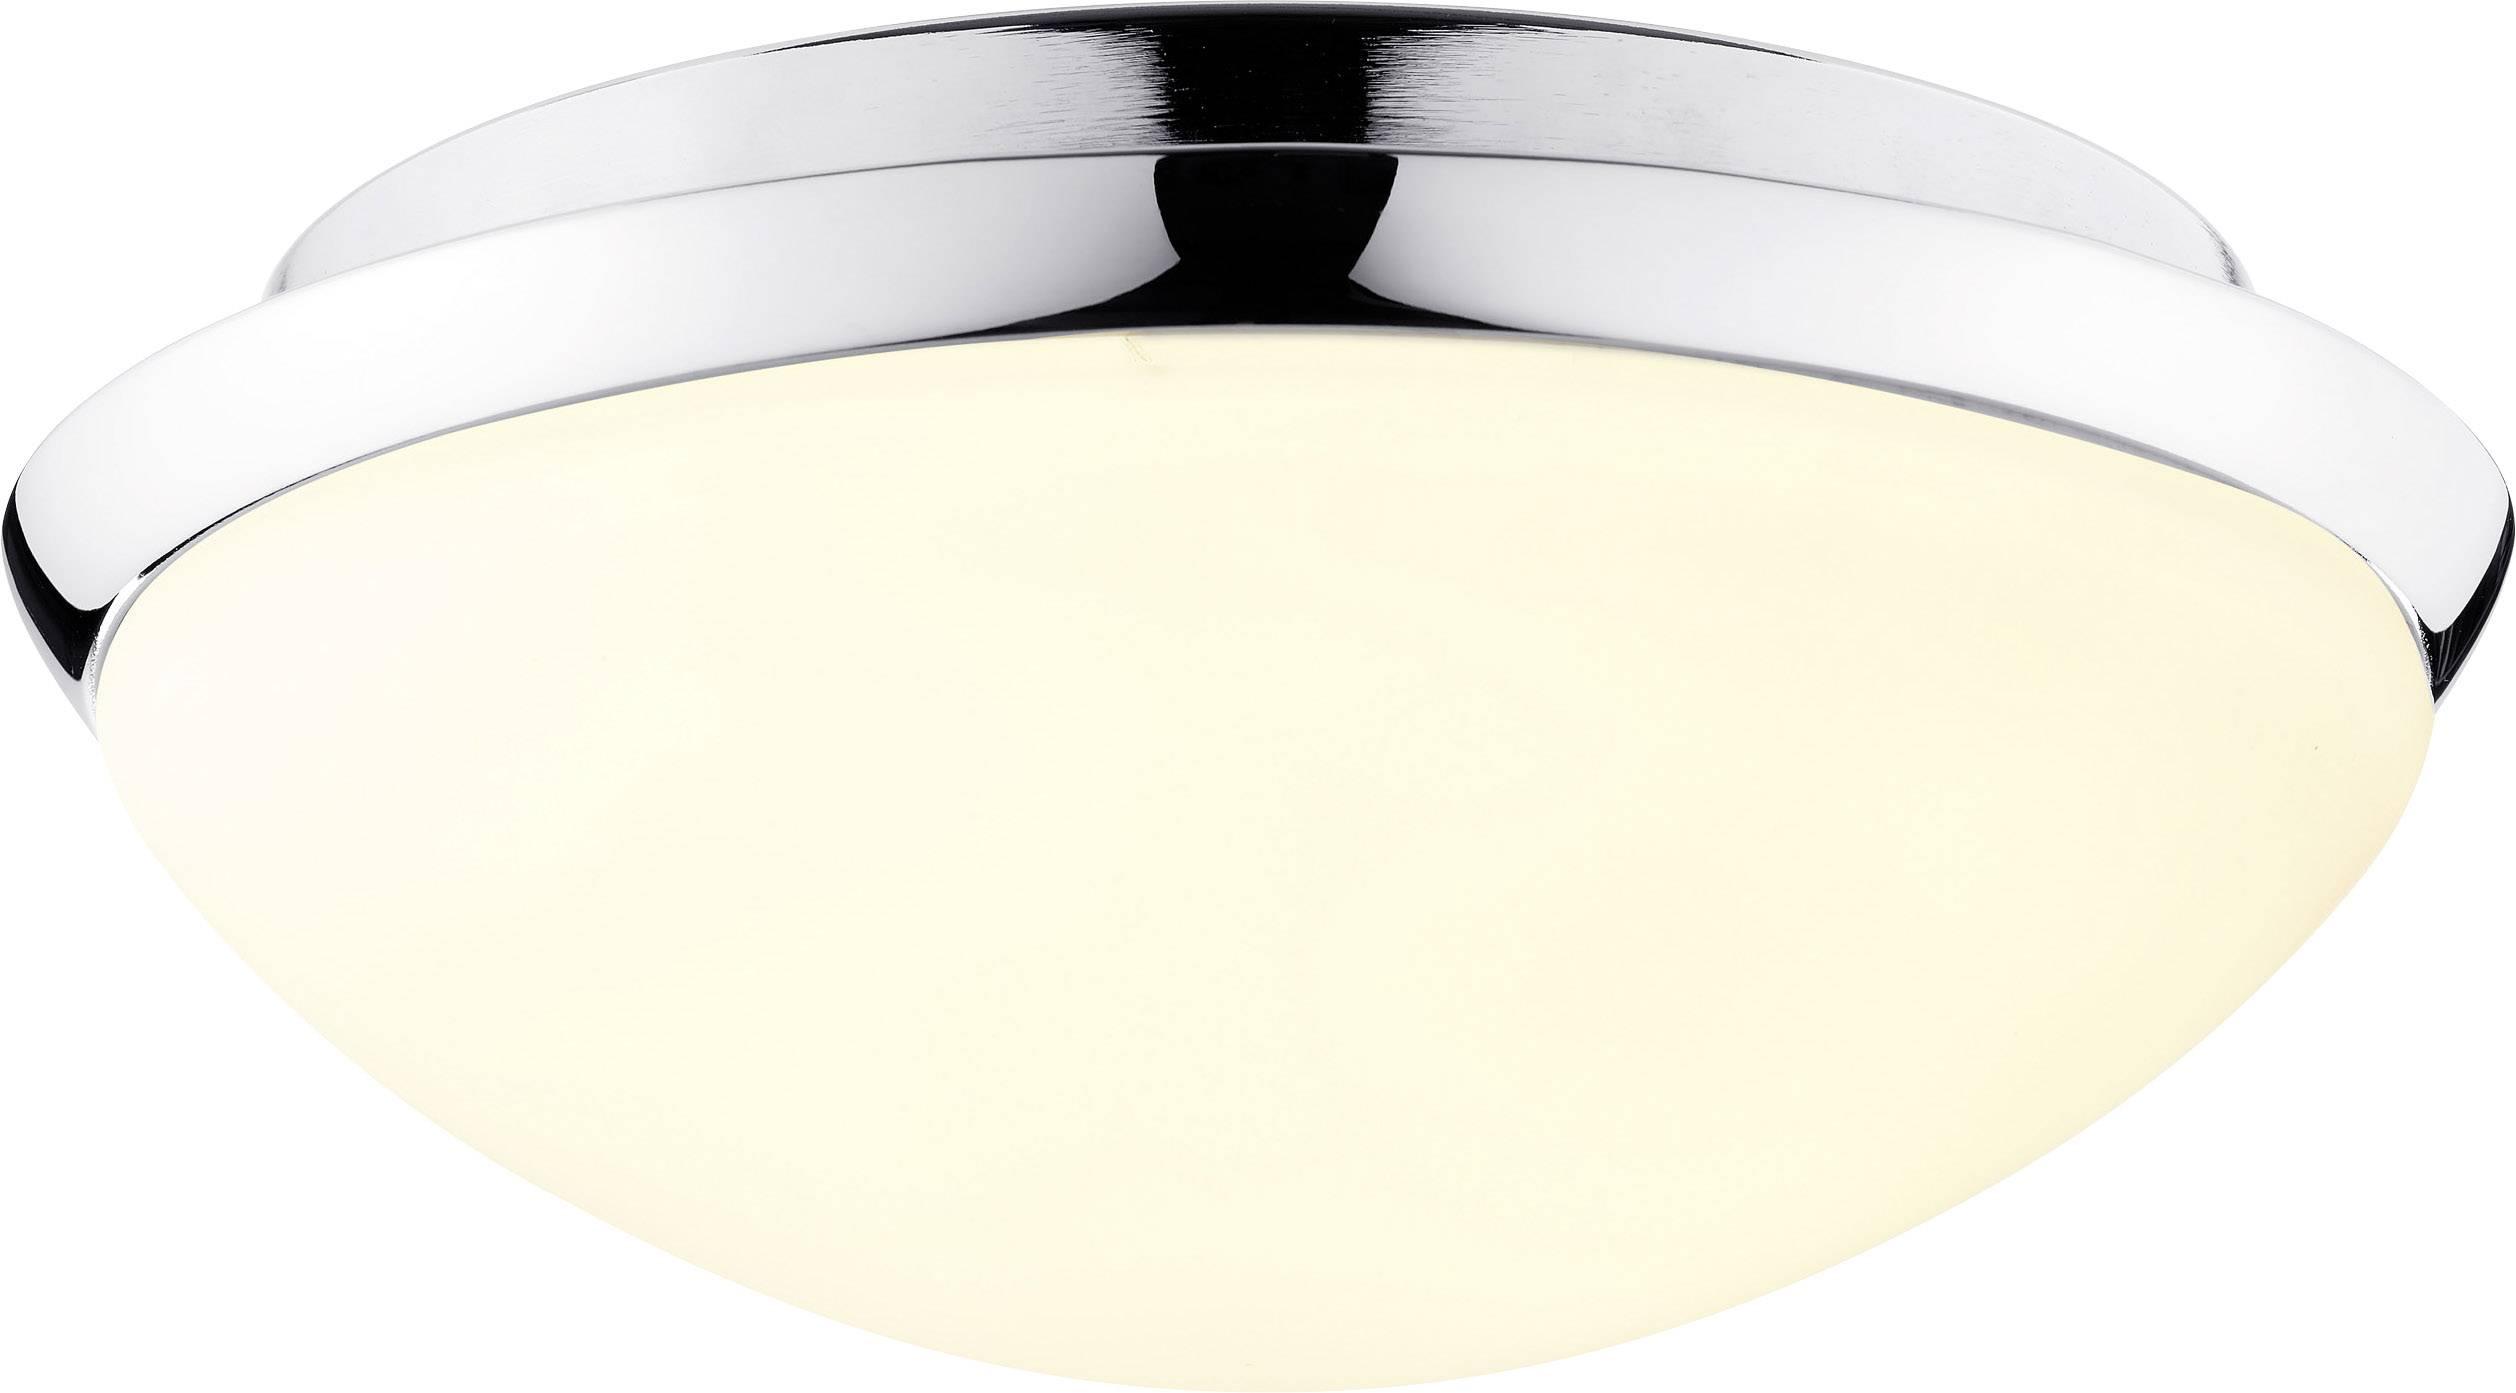 Badkamer Wandlamp Chroom : Led badkamer wandlamp 11 w warm wit paulmann 70465 polar chroom